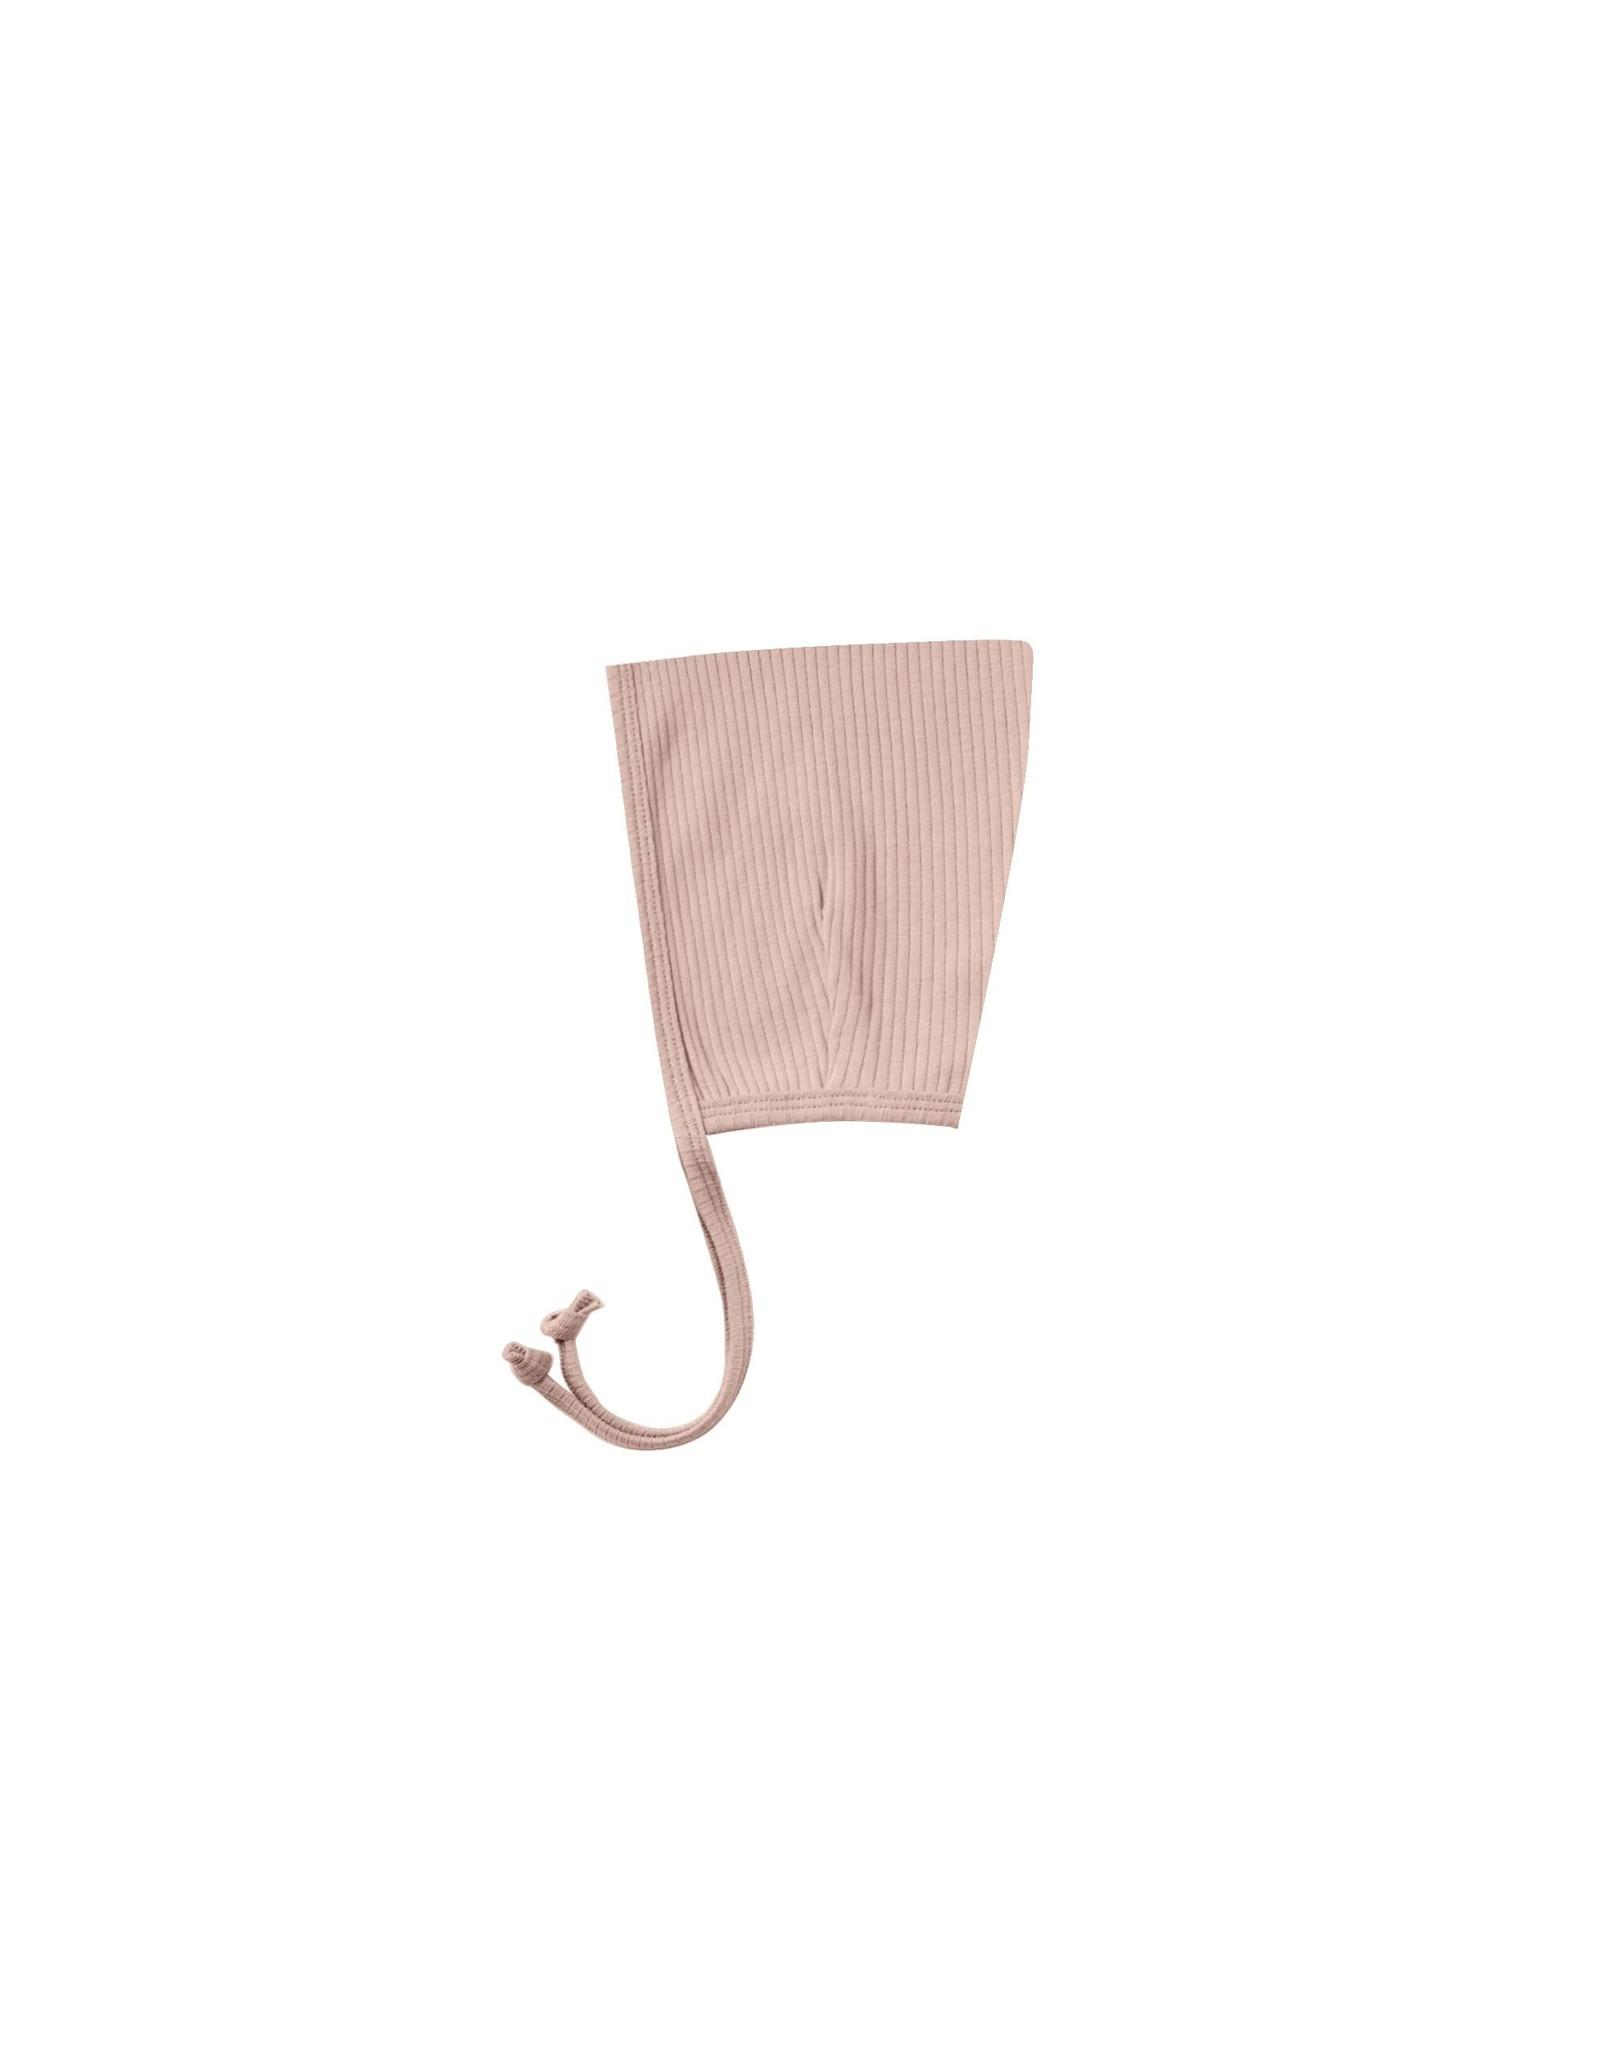 Quincy Mae Petal Ribbed Bonnet